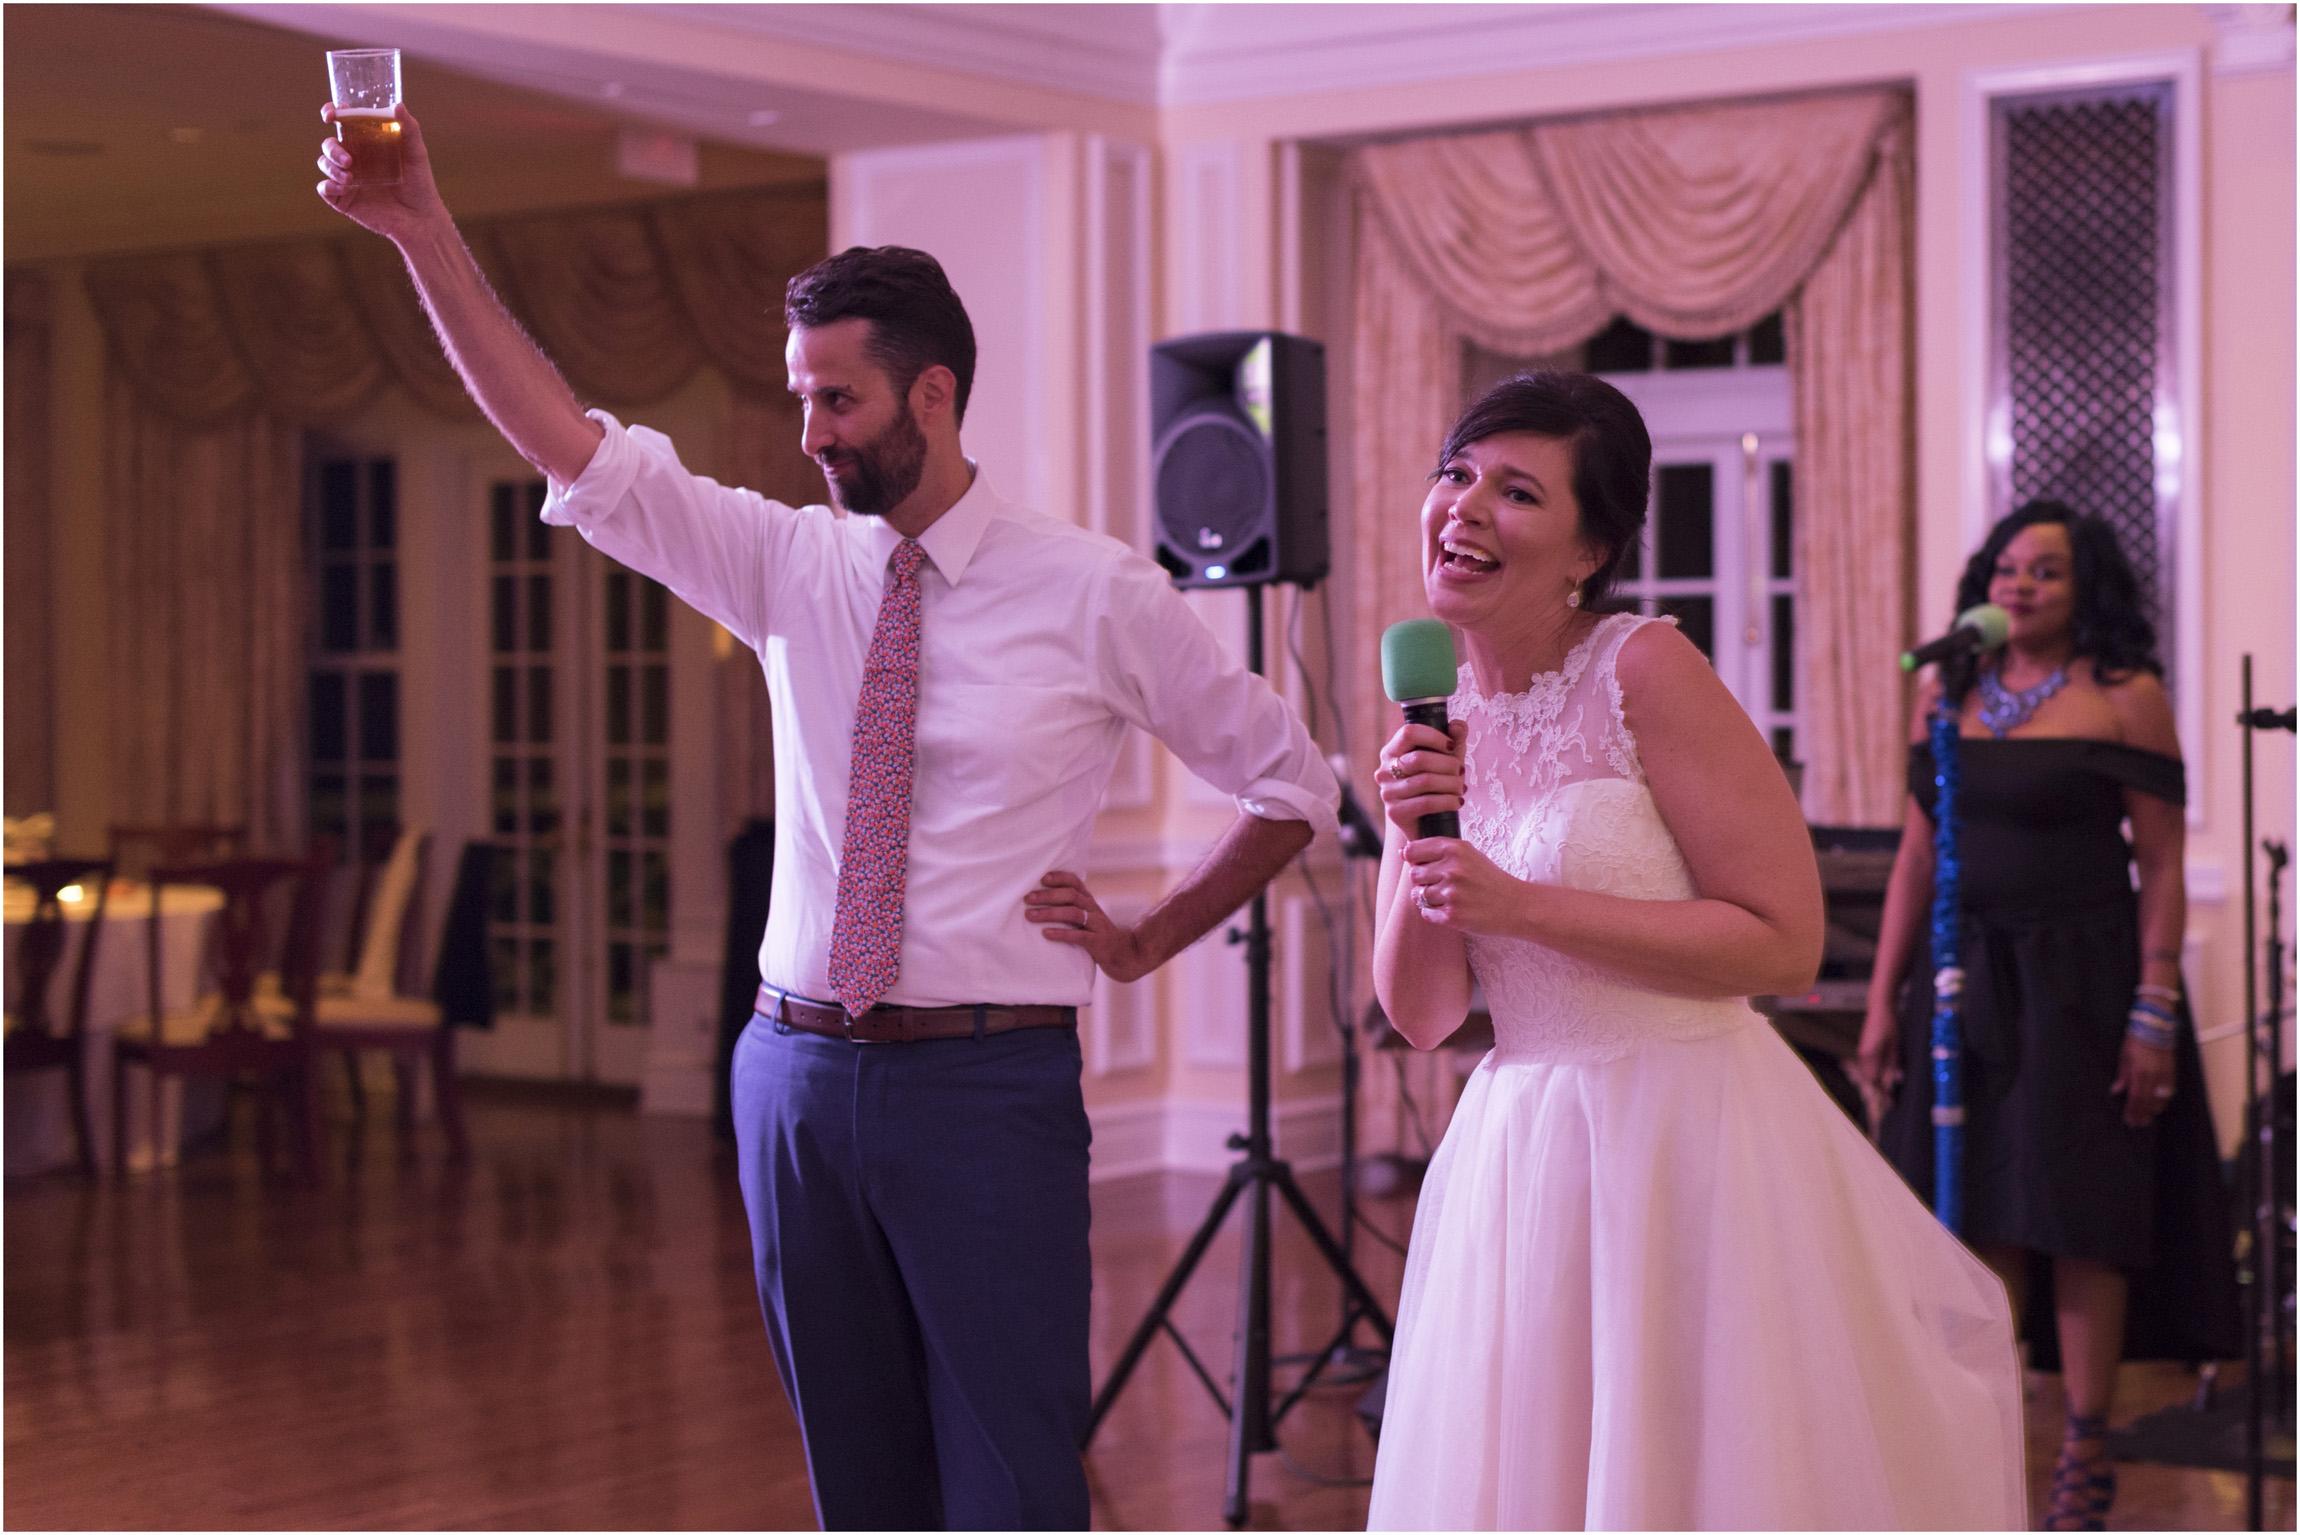 ©FianderFoto_Melissa_Mark_Wedding_Maryland_044.jpg